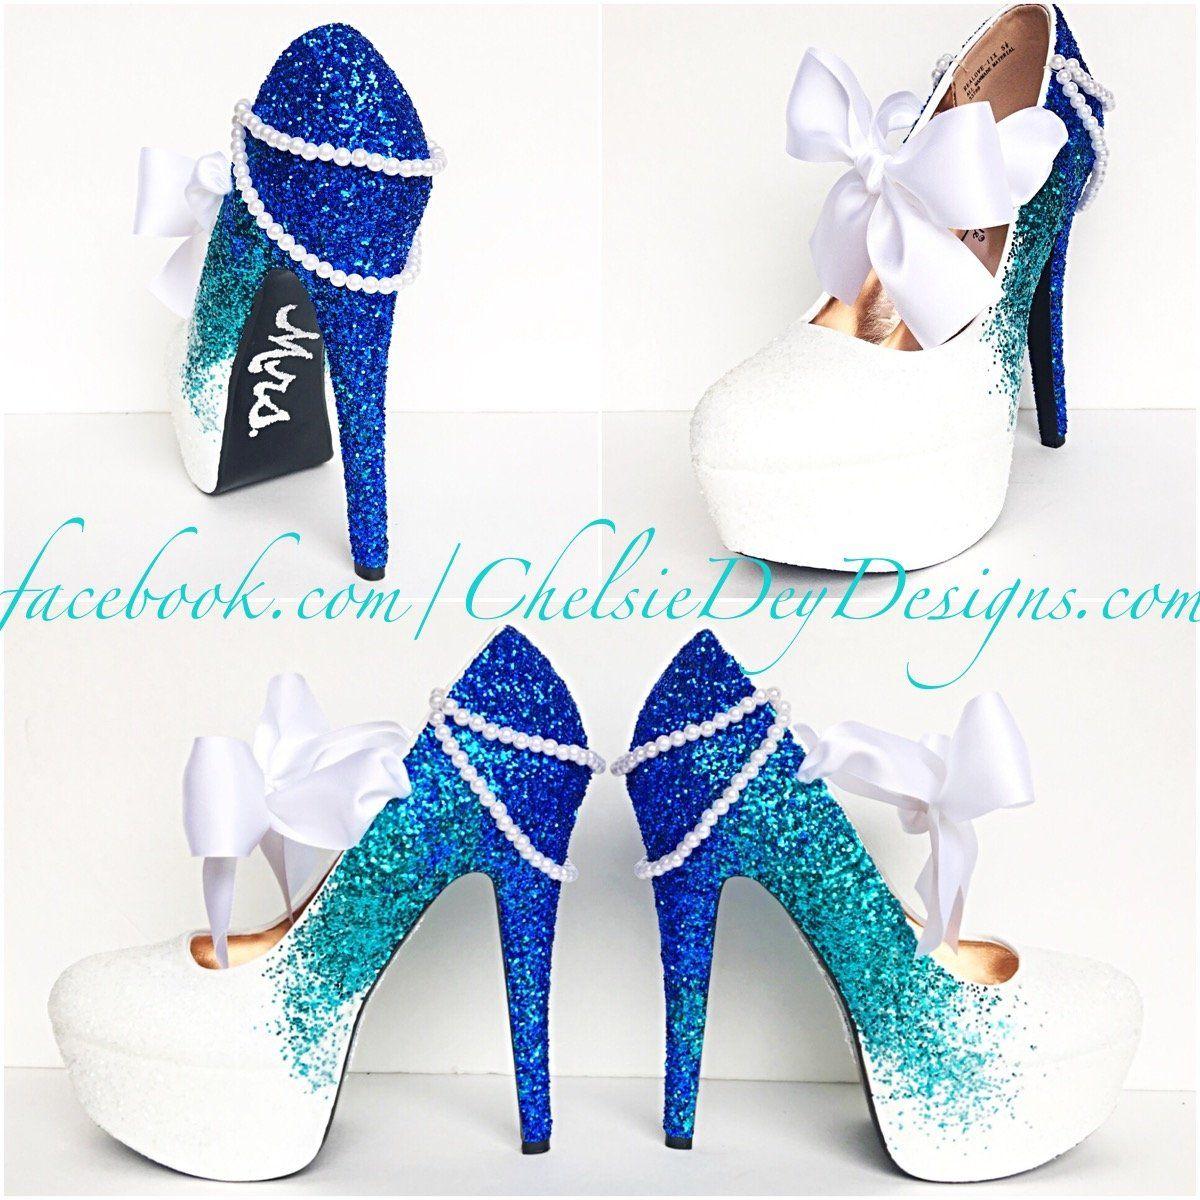 White wedding shoes, Royal blue pumps